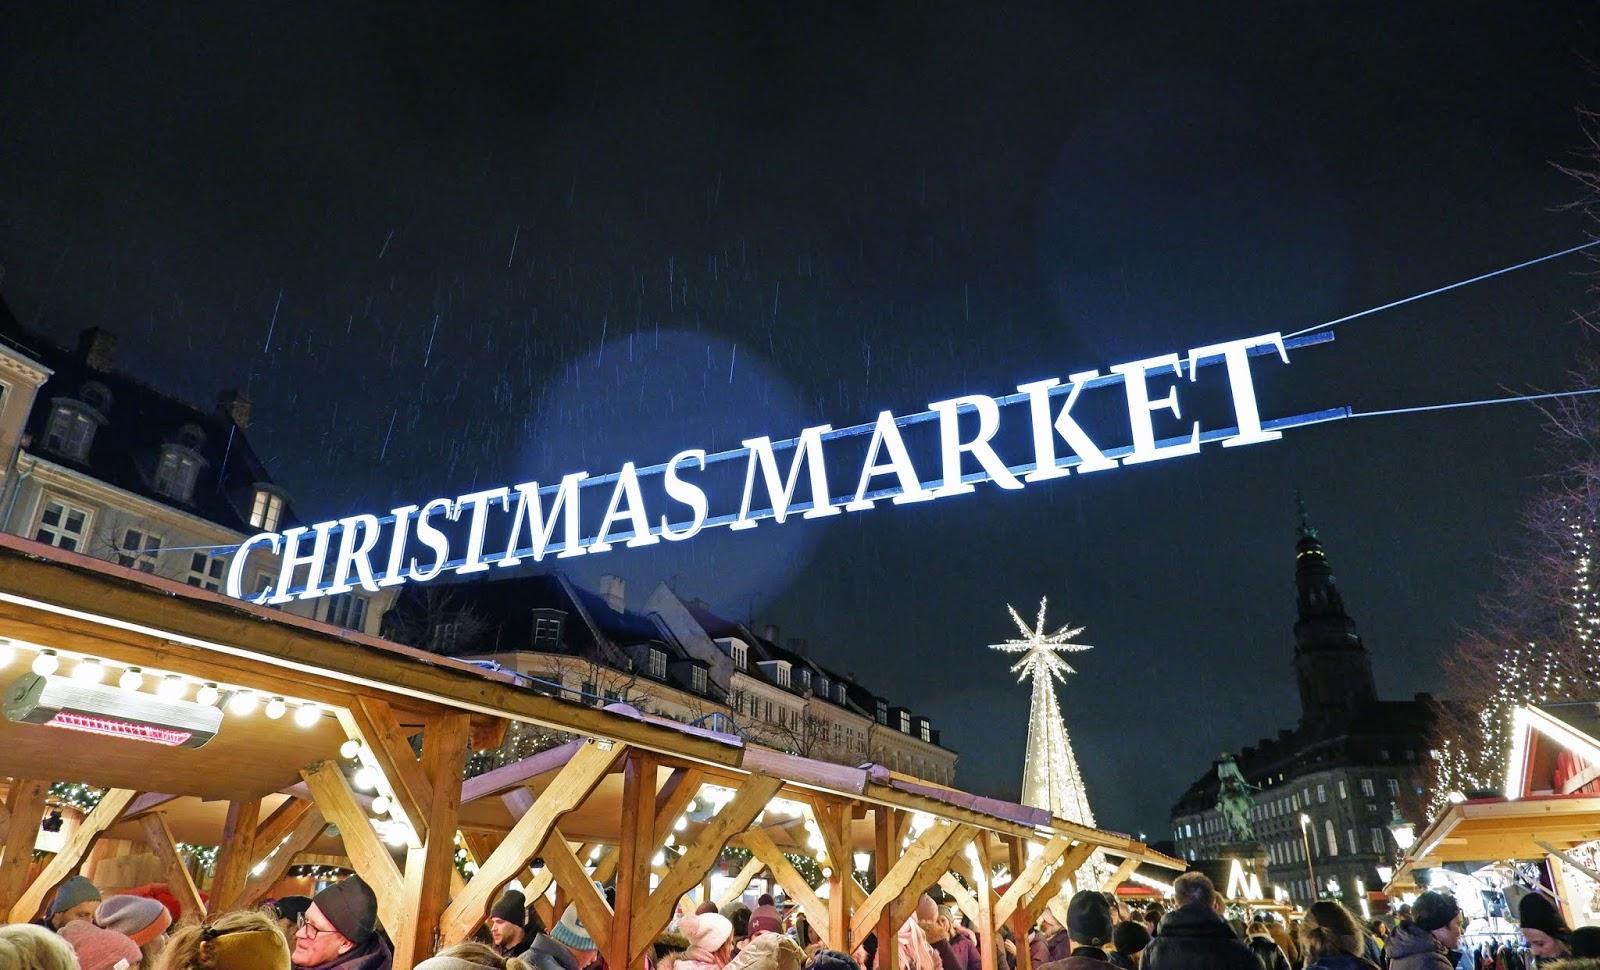 Højbro Square Christmas Market in the rain